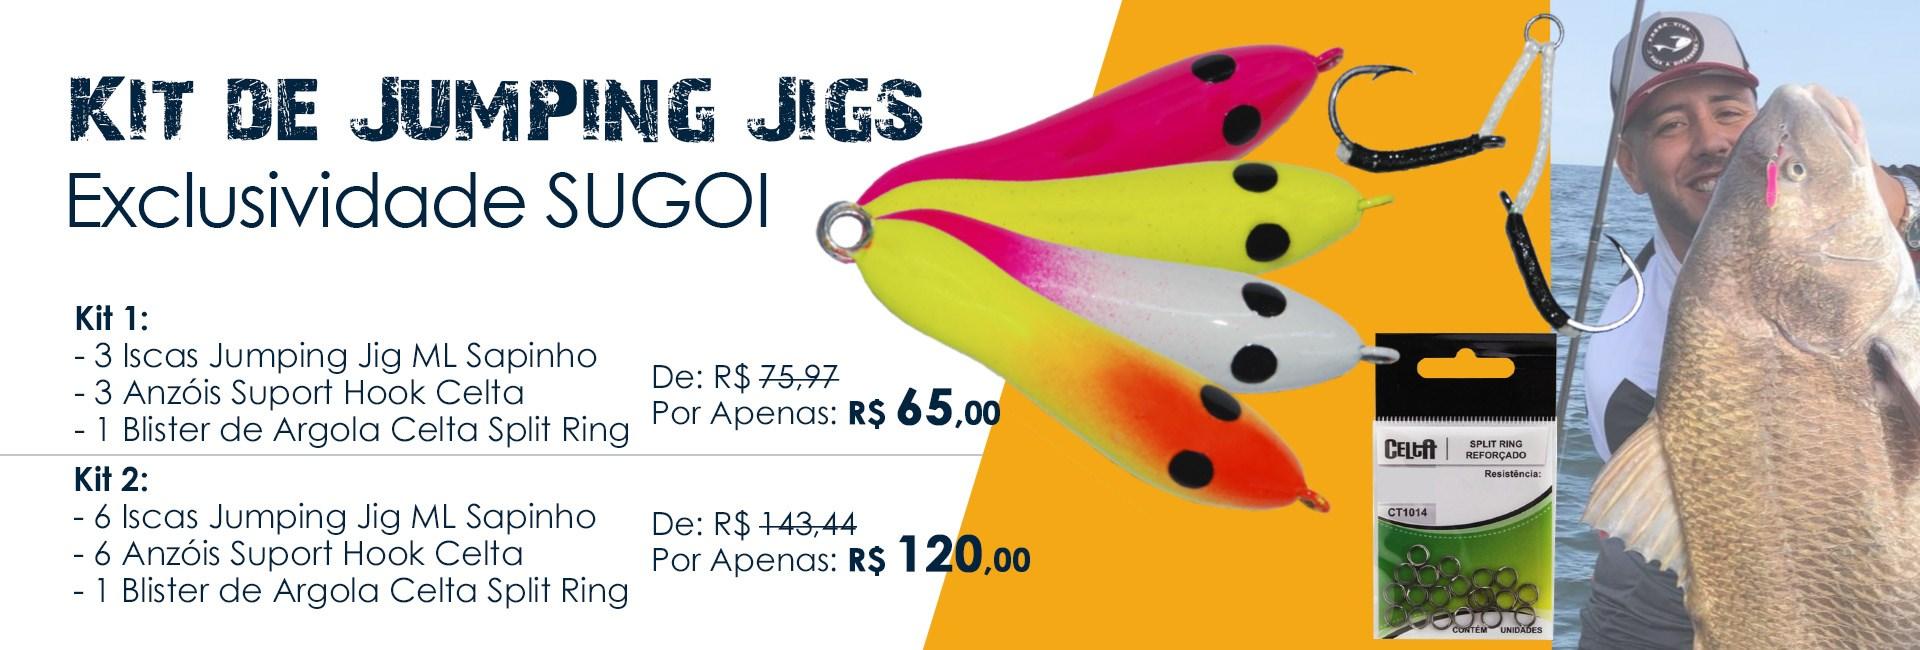 Combo de Jumping Jigs SUGOI